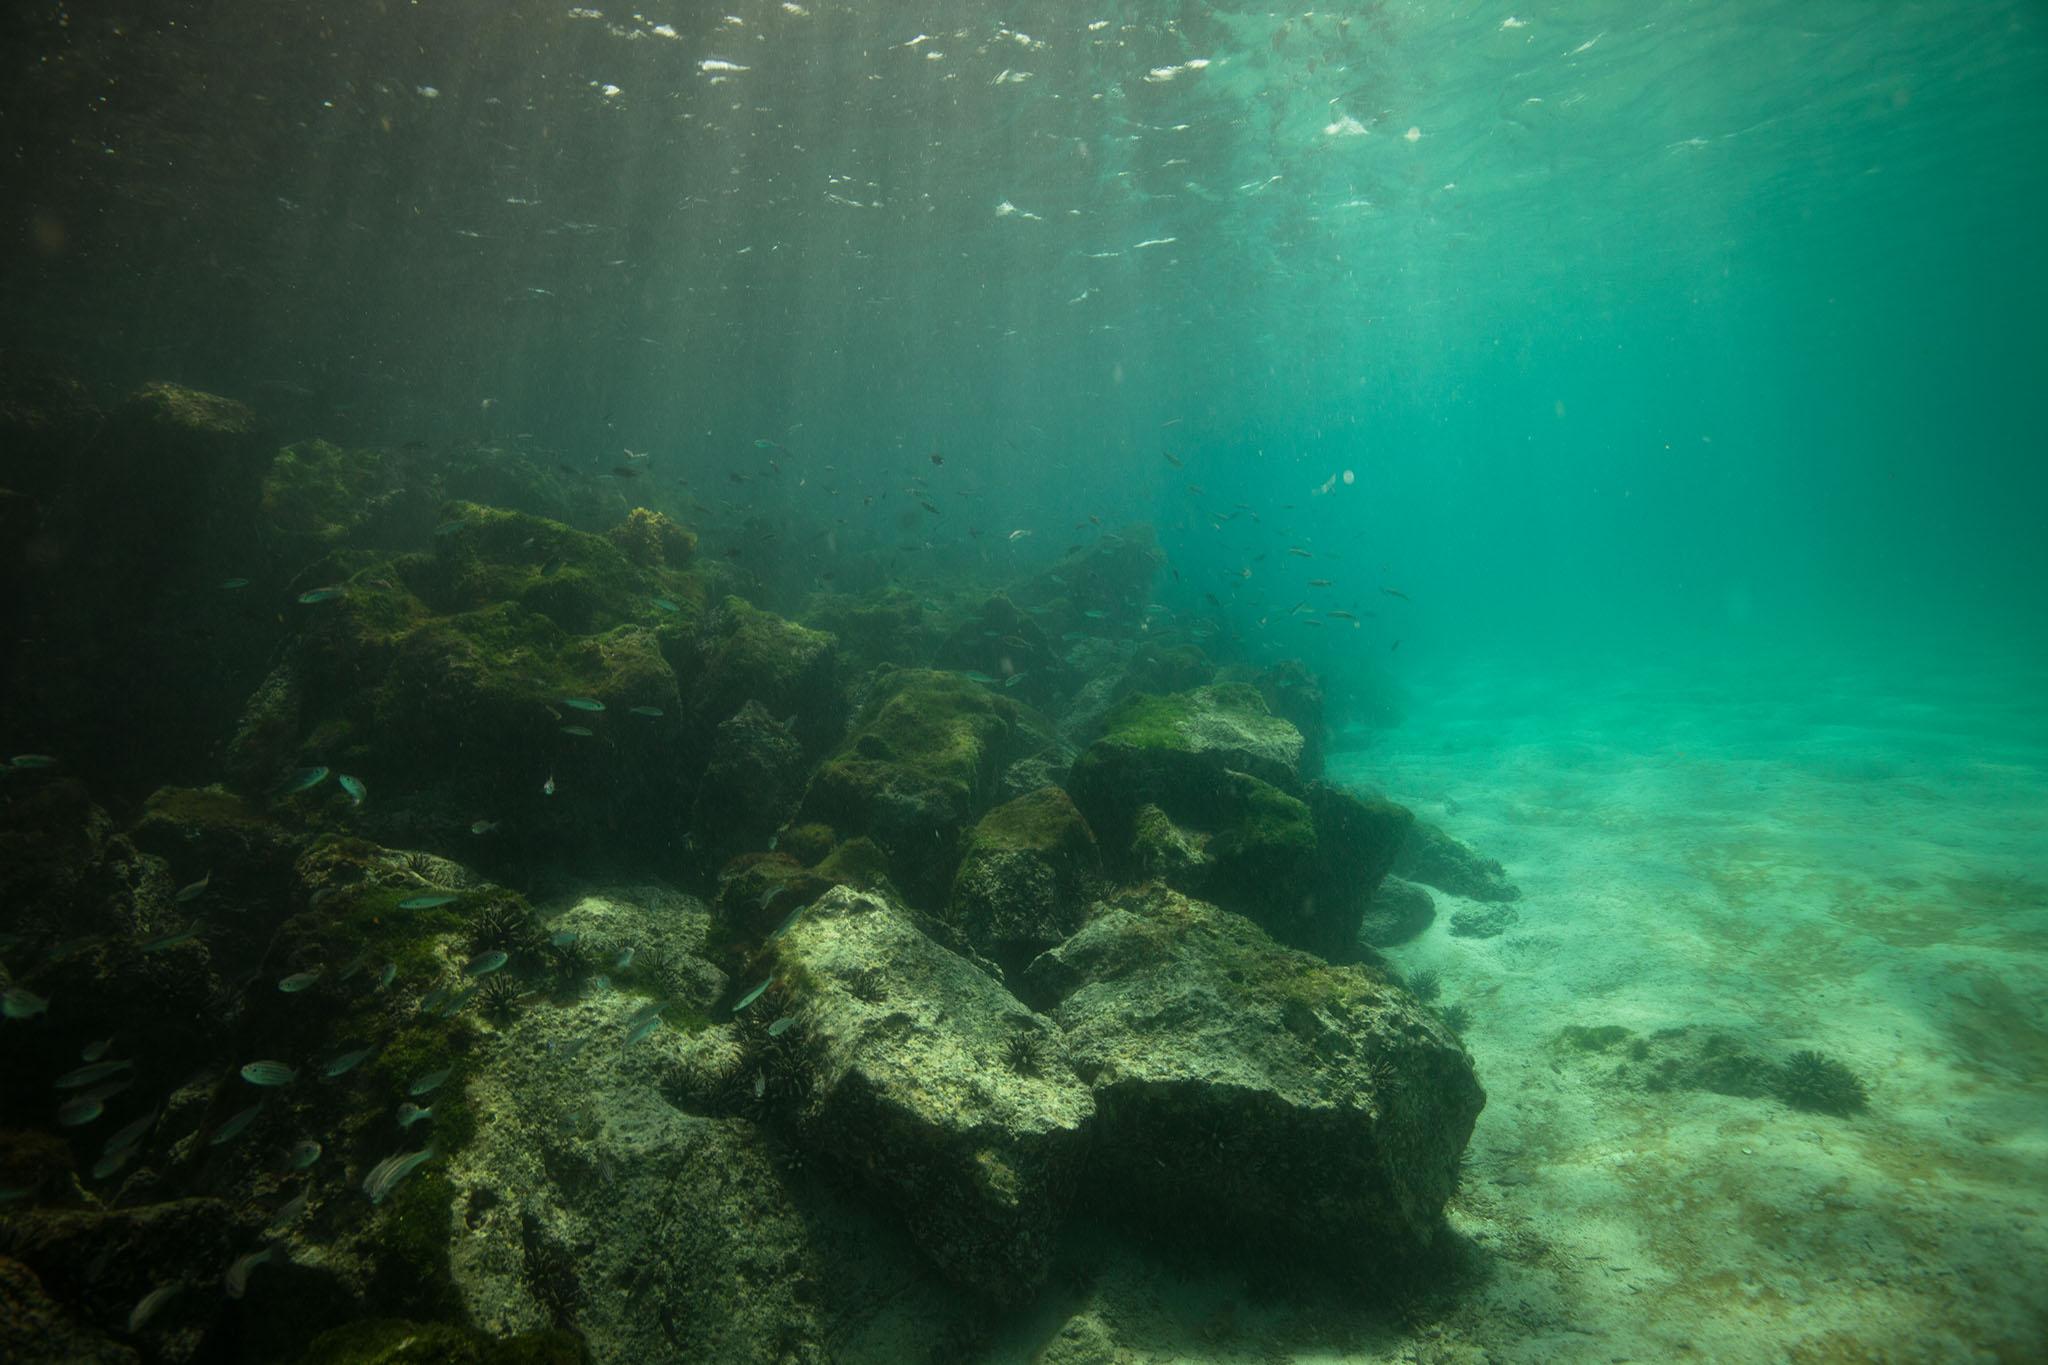 TimWatters-Underwater-11.jpg